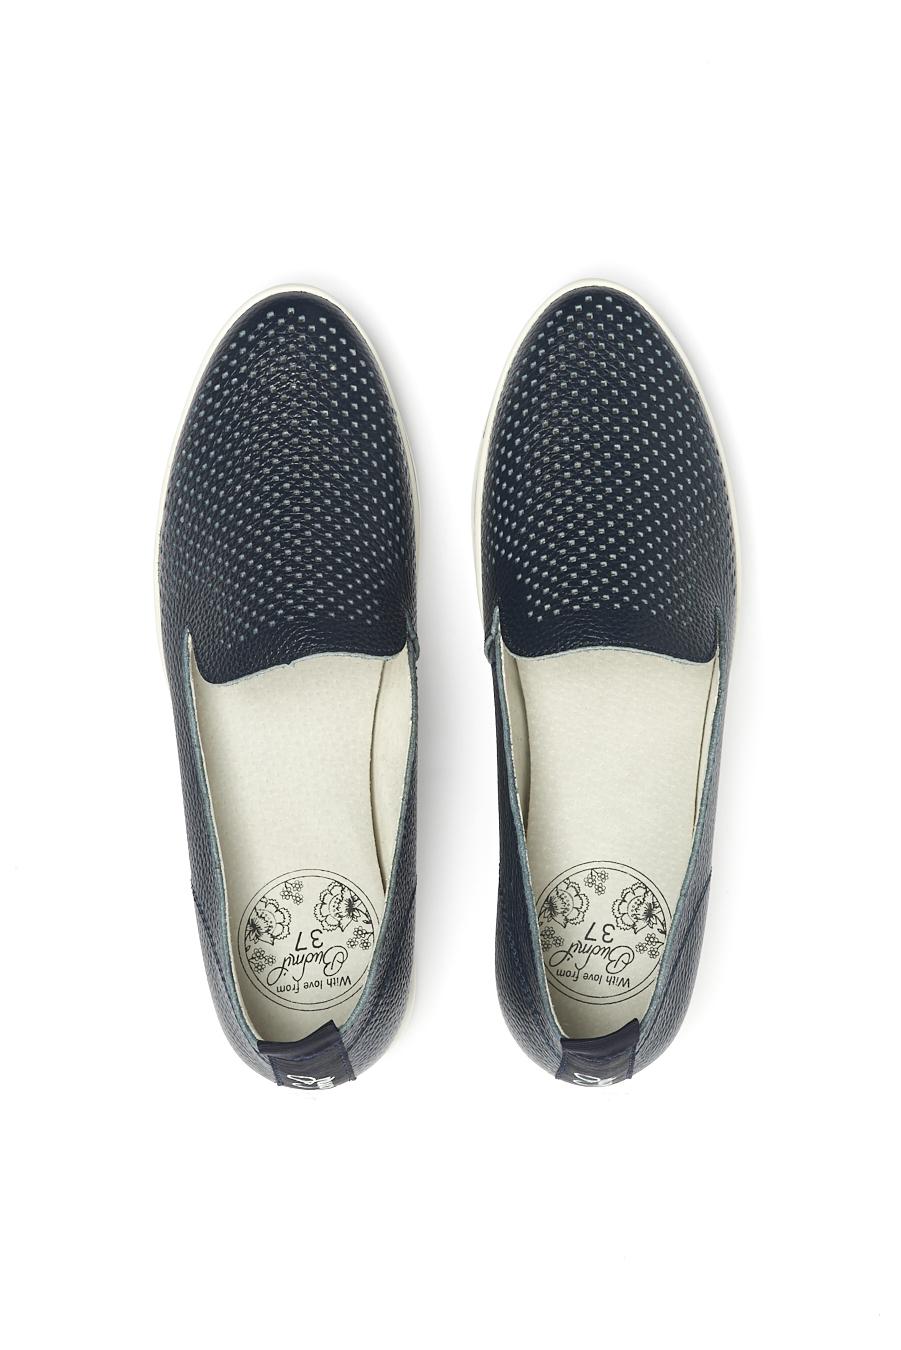 női bőrcipő s.kék | Női és Férfi utcai cipő webshop | budmil  női bőrcipő | budmil